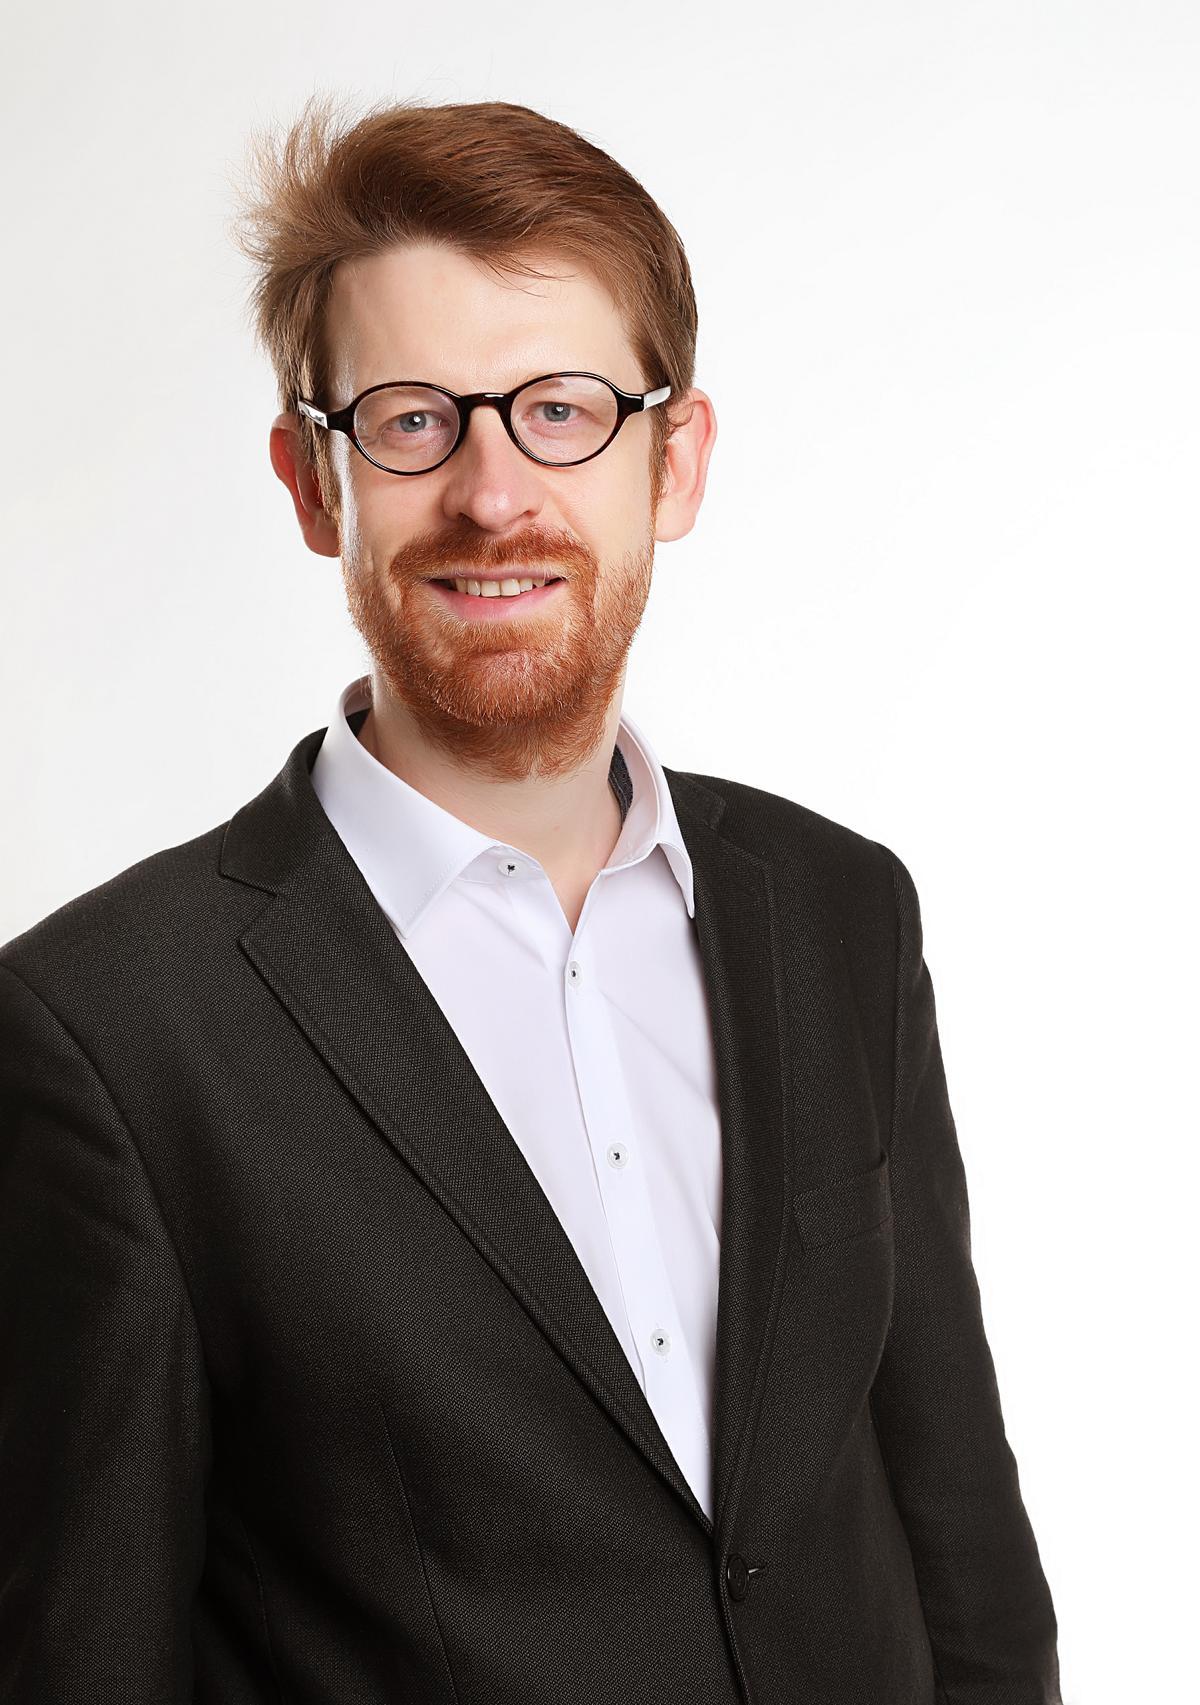 Daniel Koppehl